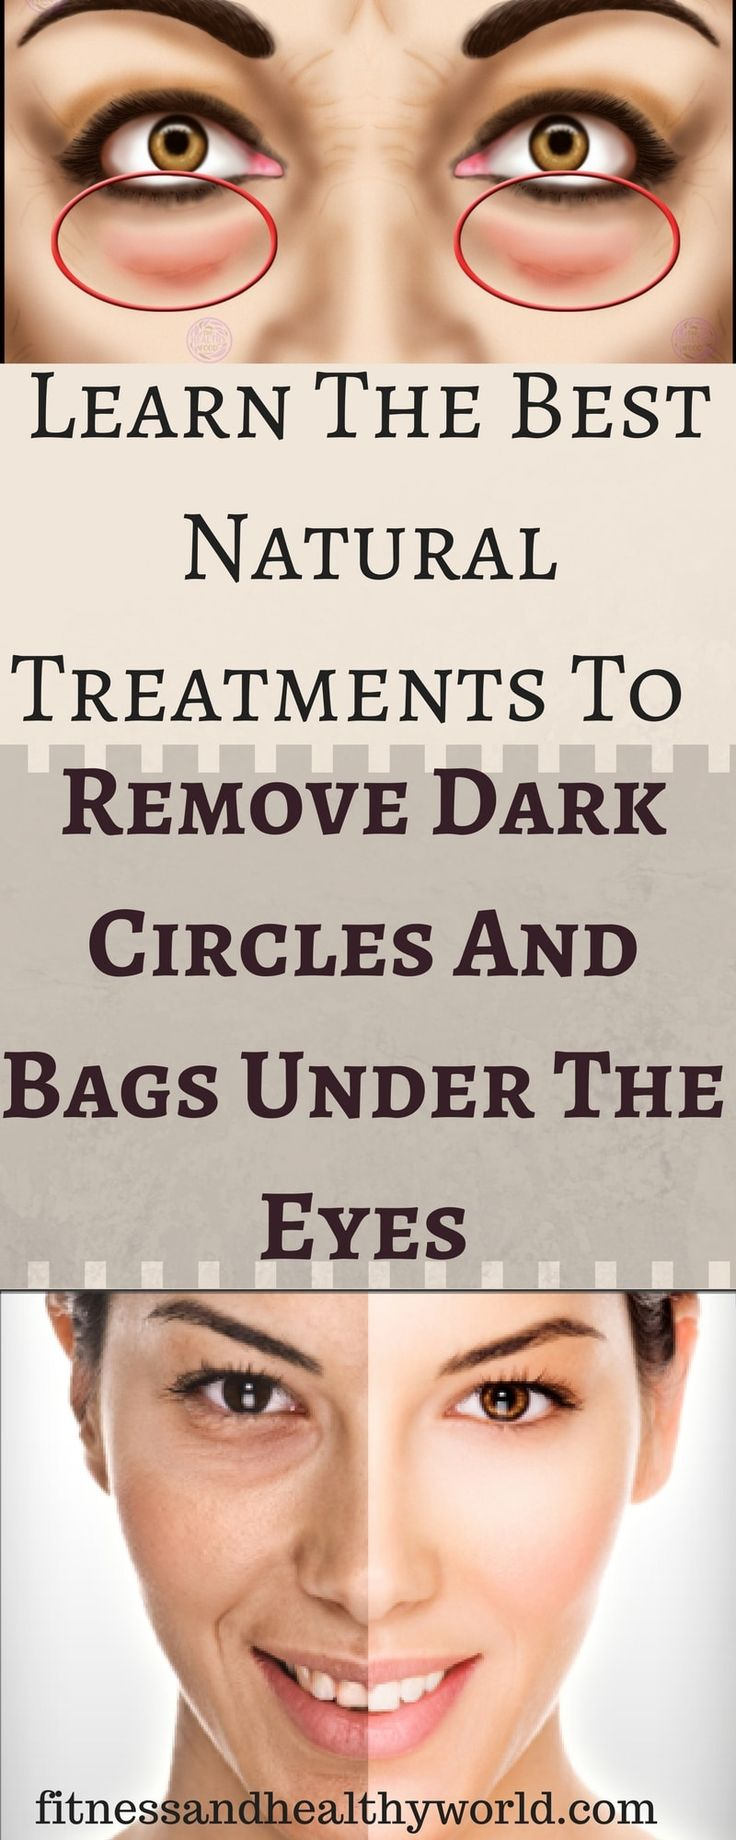 Treatments To Remove Dark Circles